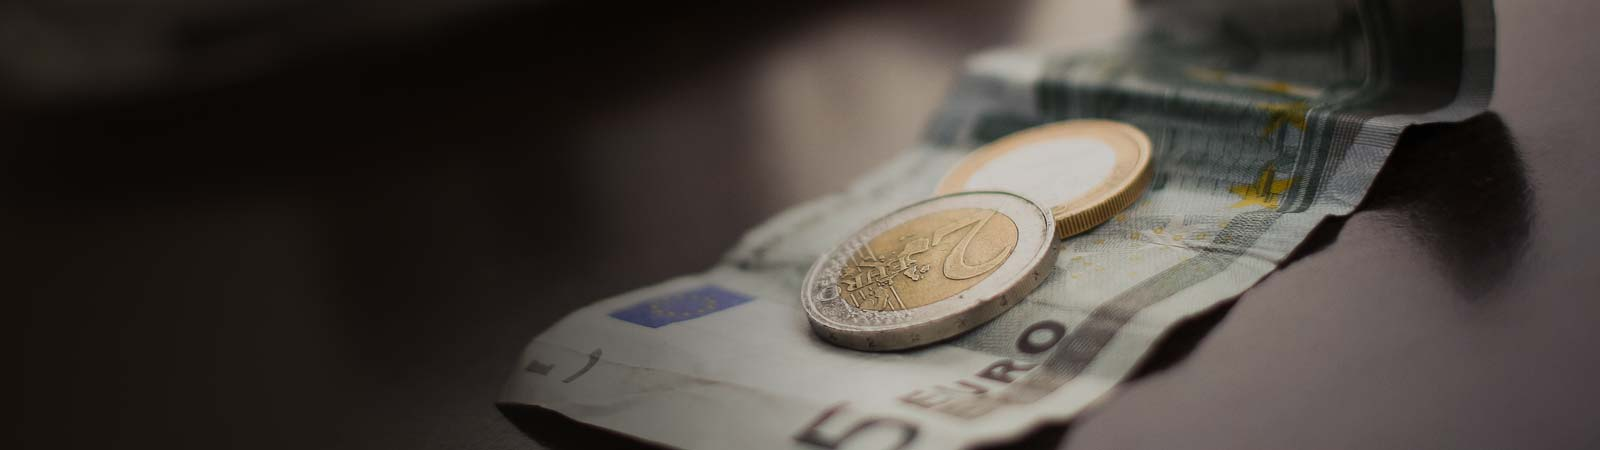 Cash loans fair credit photo 4